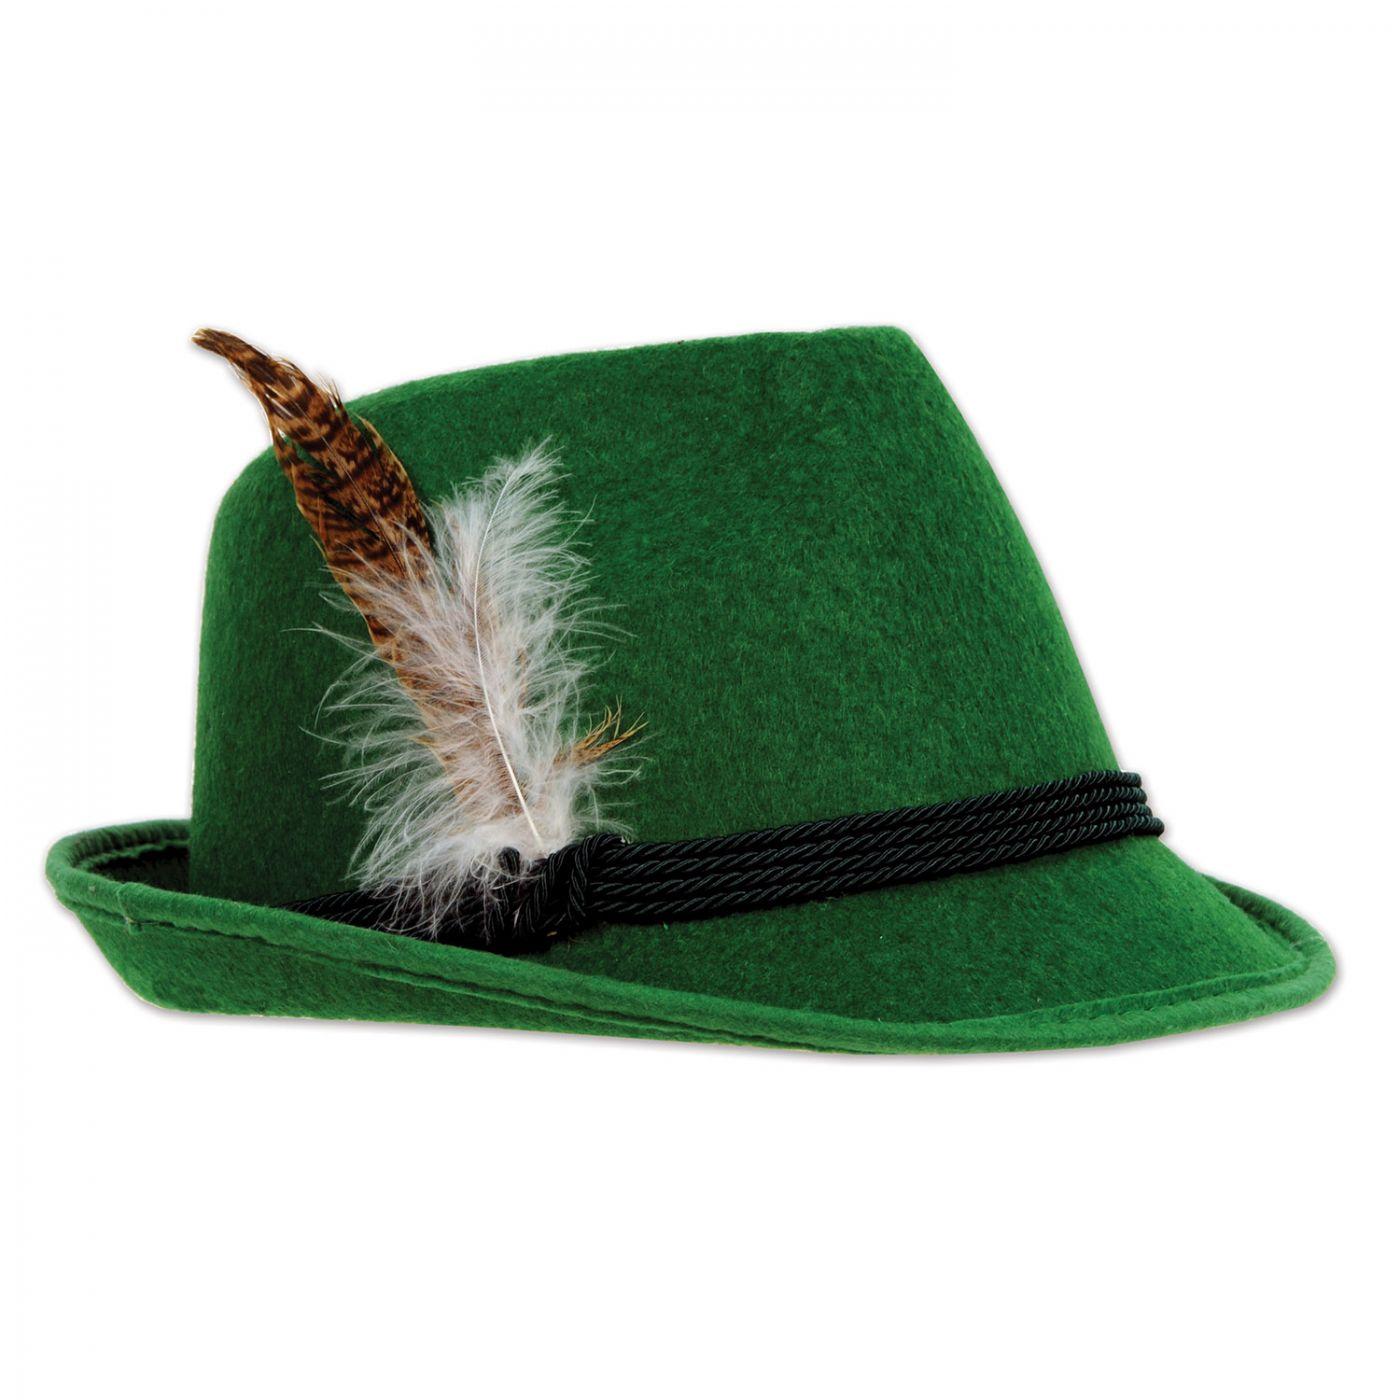 Deluxe Alpine Hat (6) image